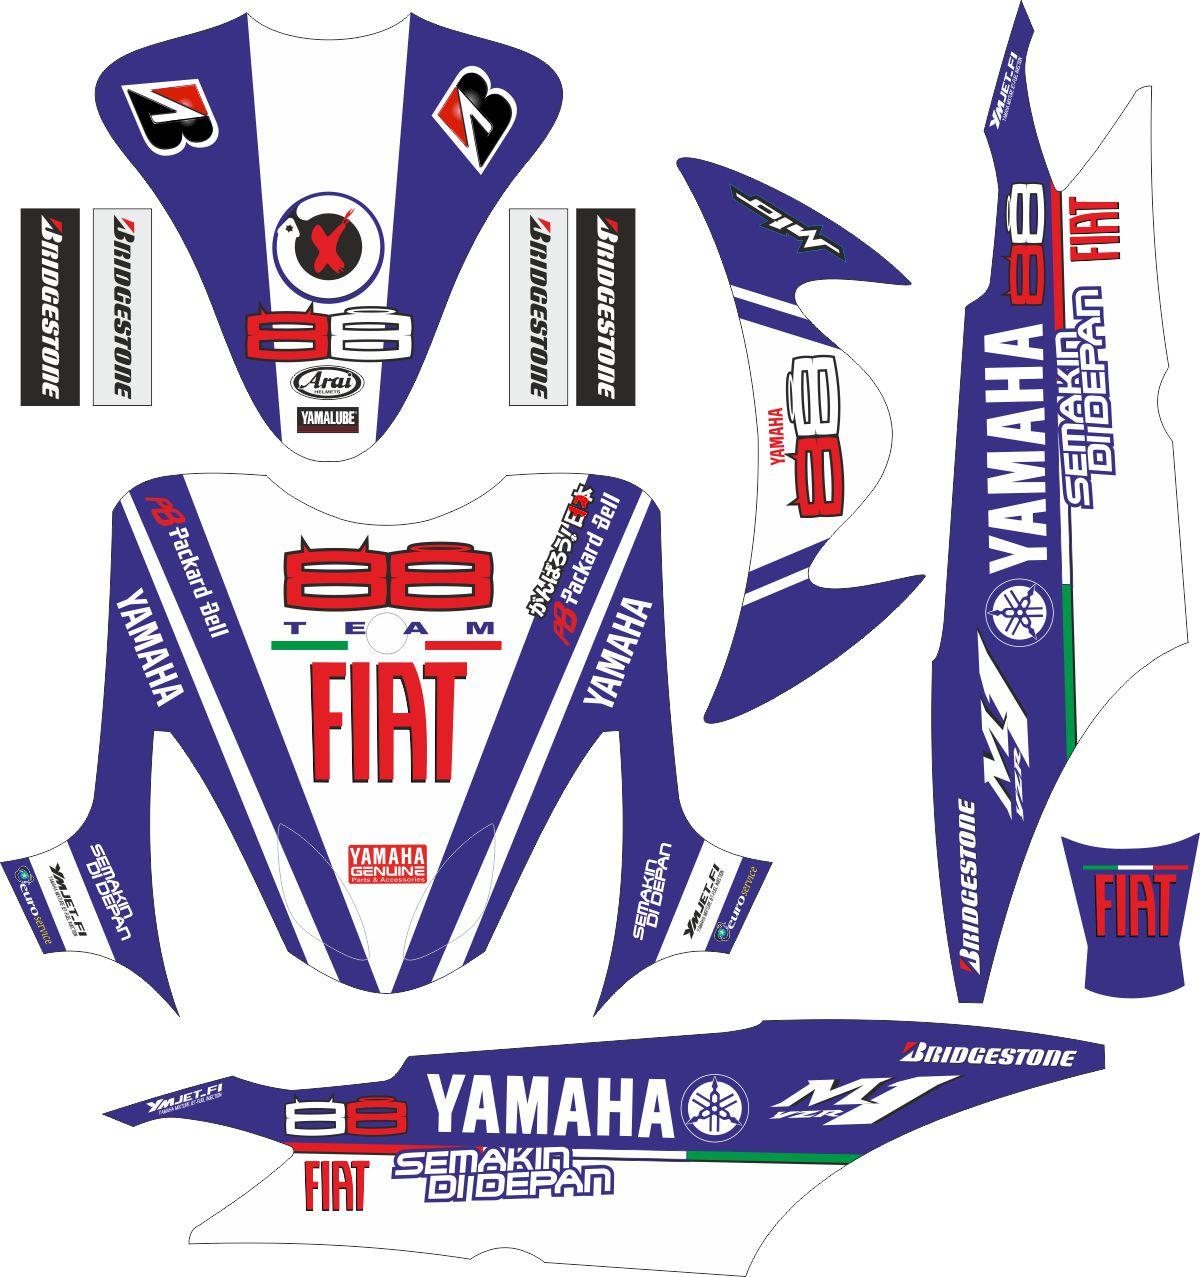 Комплект наклеек на скутер YAMAHA SIAP PRINT YAMAHA MIO PUTIH FIAT 88